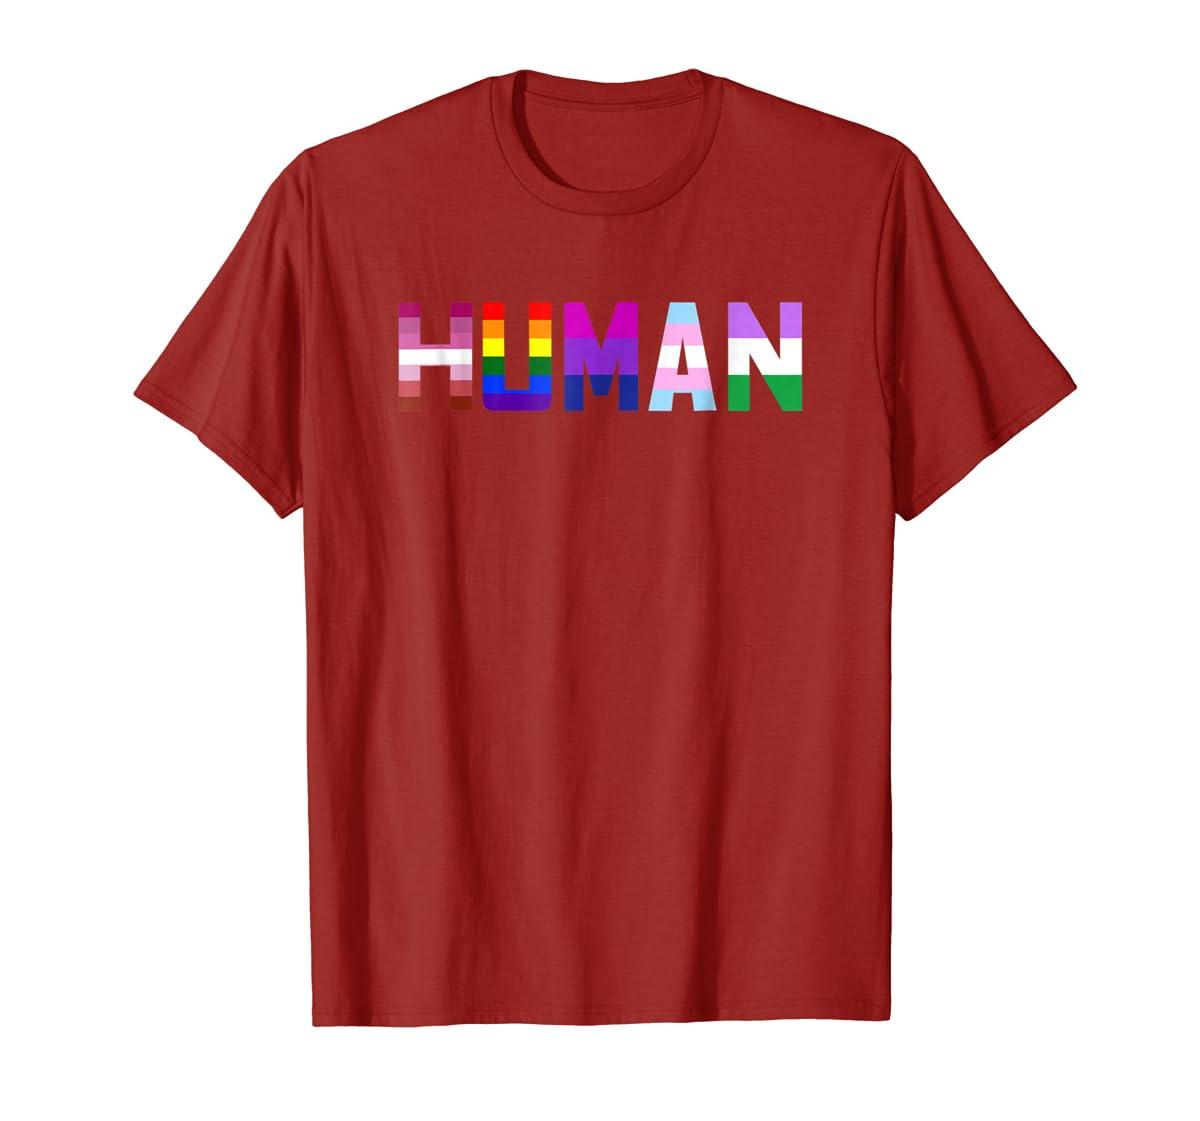 HUMAN Flag LGBT Gay Pride Month Transgender Ally T Shirt-Men's T-Shirt-Red